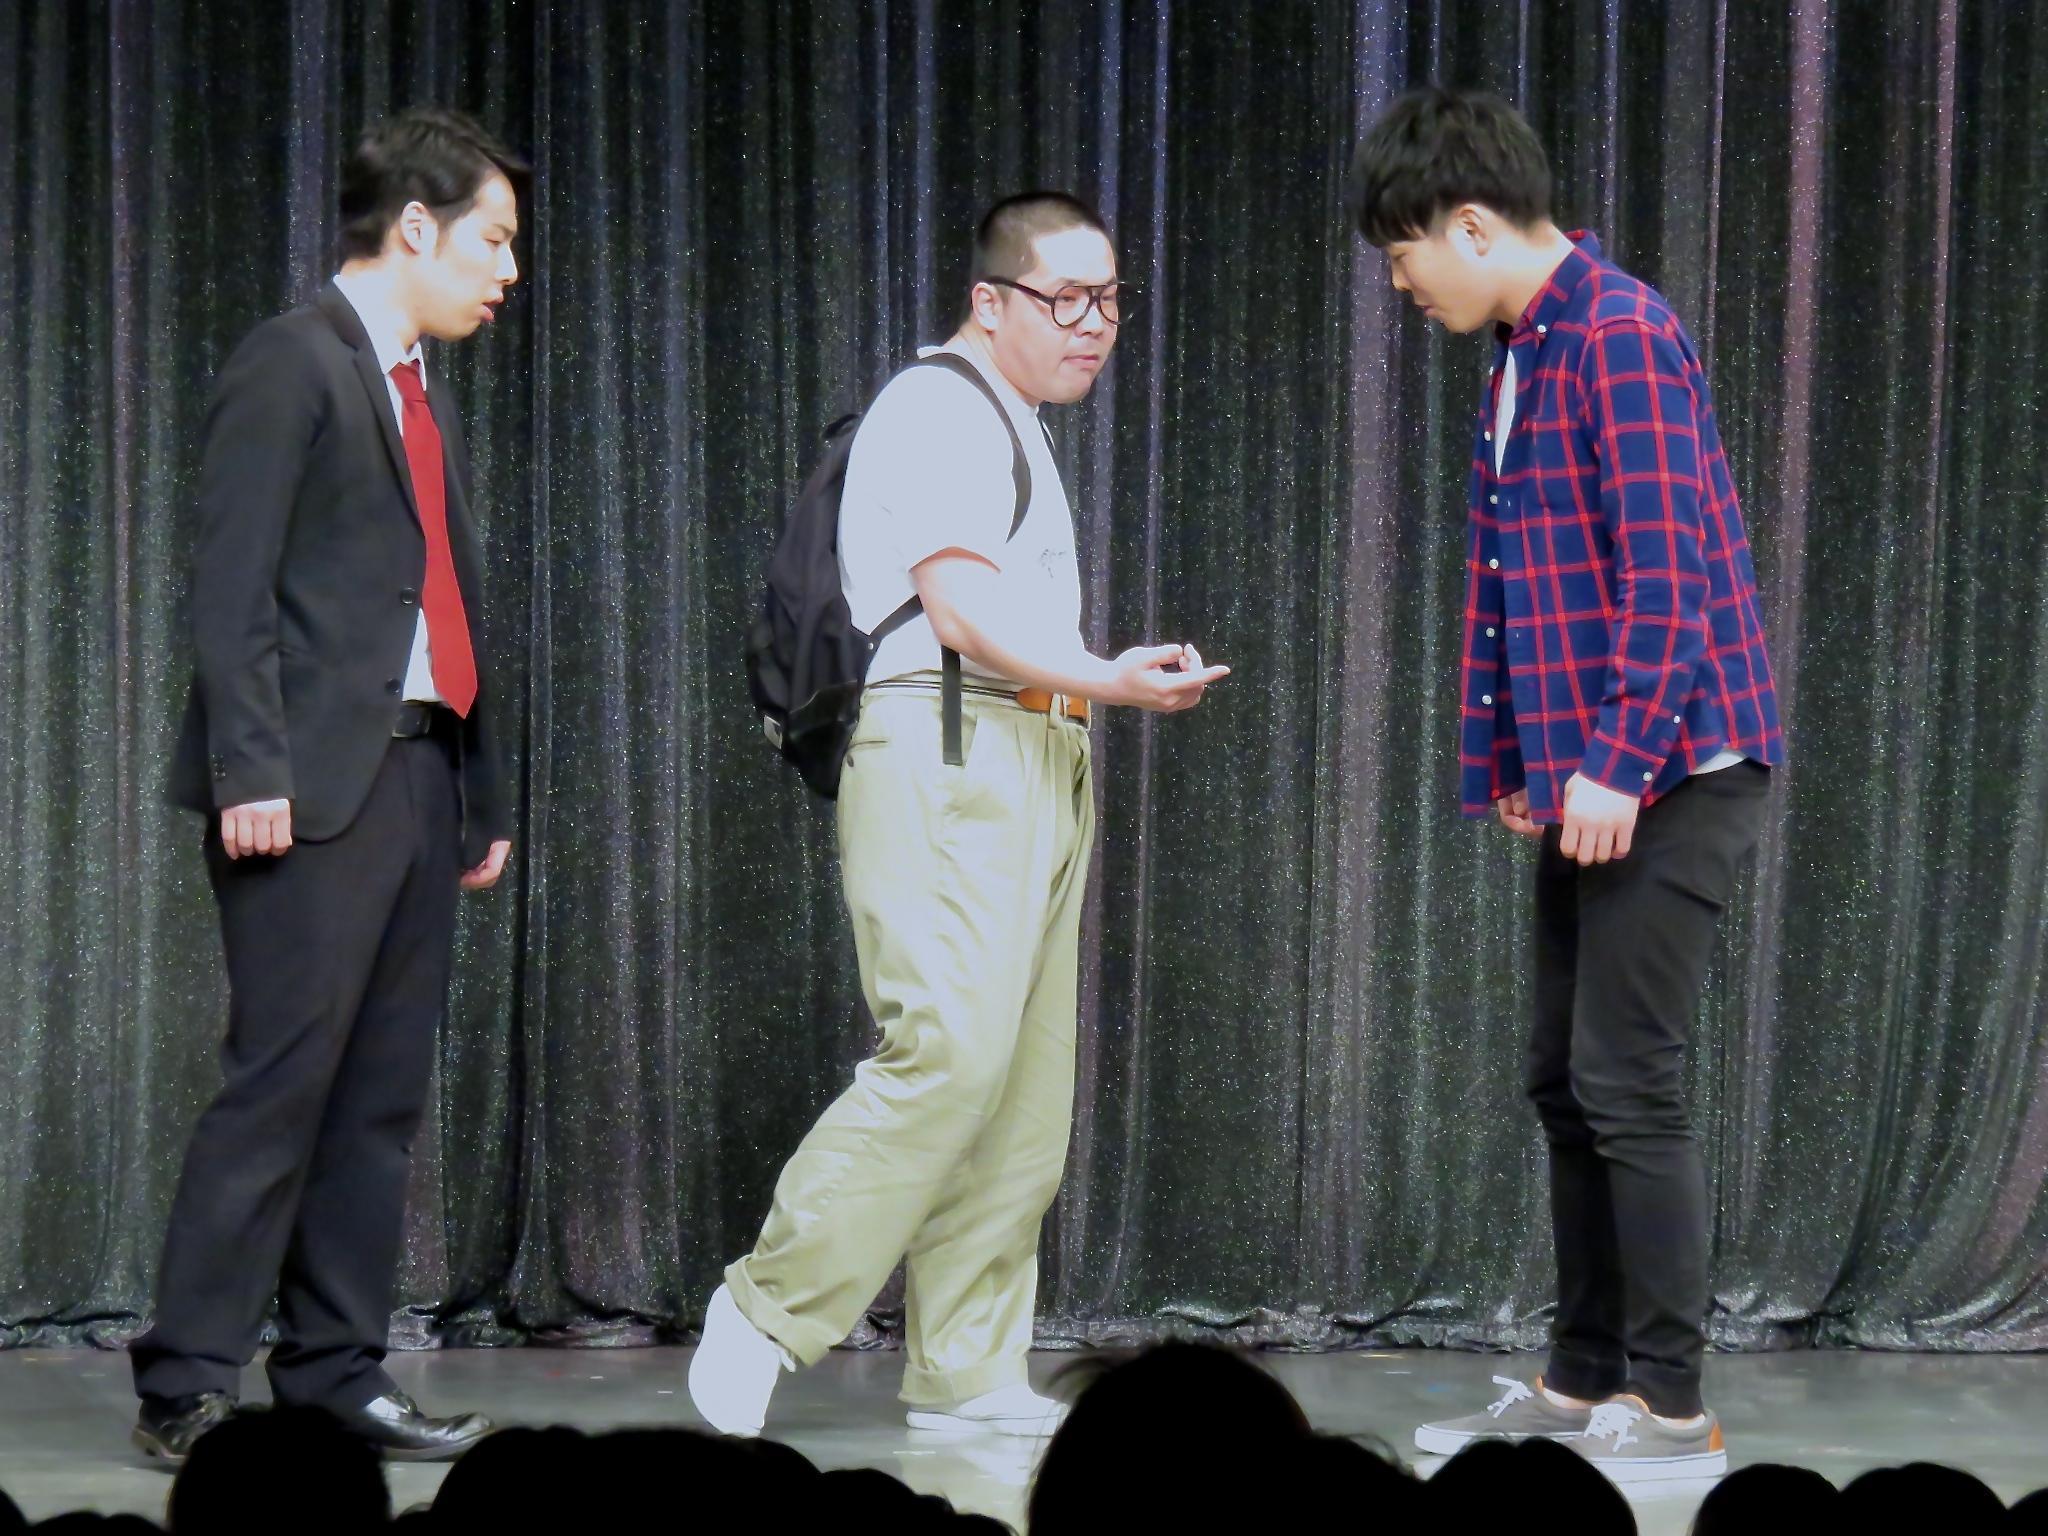 http://news.yoshimoto.co.jp/20151230165209-6bab778407af0475247baafca79d3d91c0884c9e.jpg